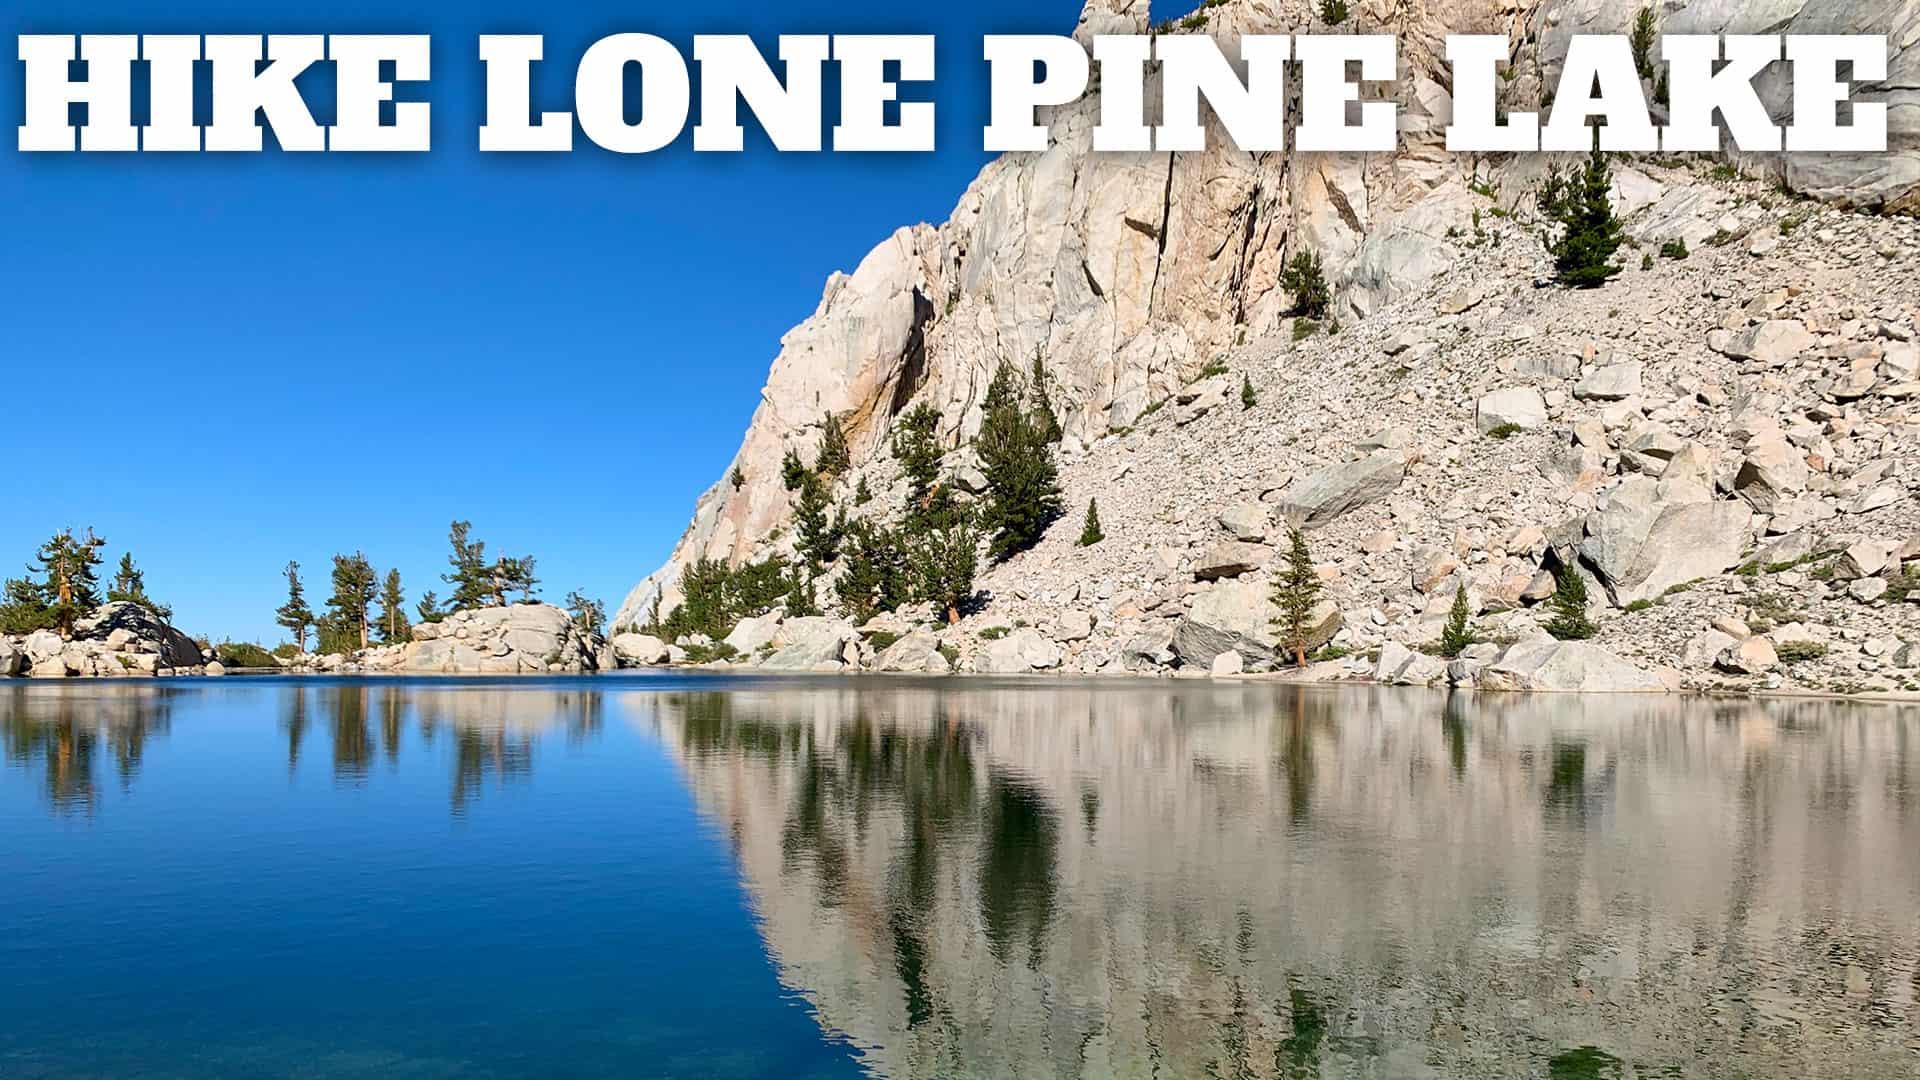 Lone Pine Lake Hike